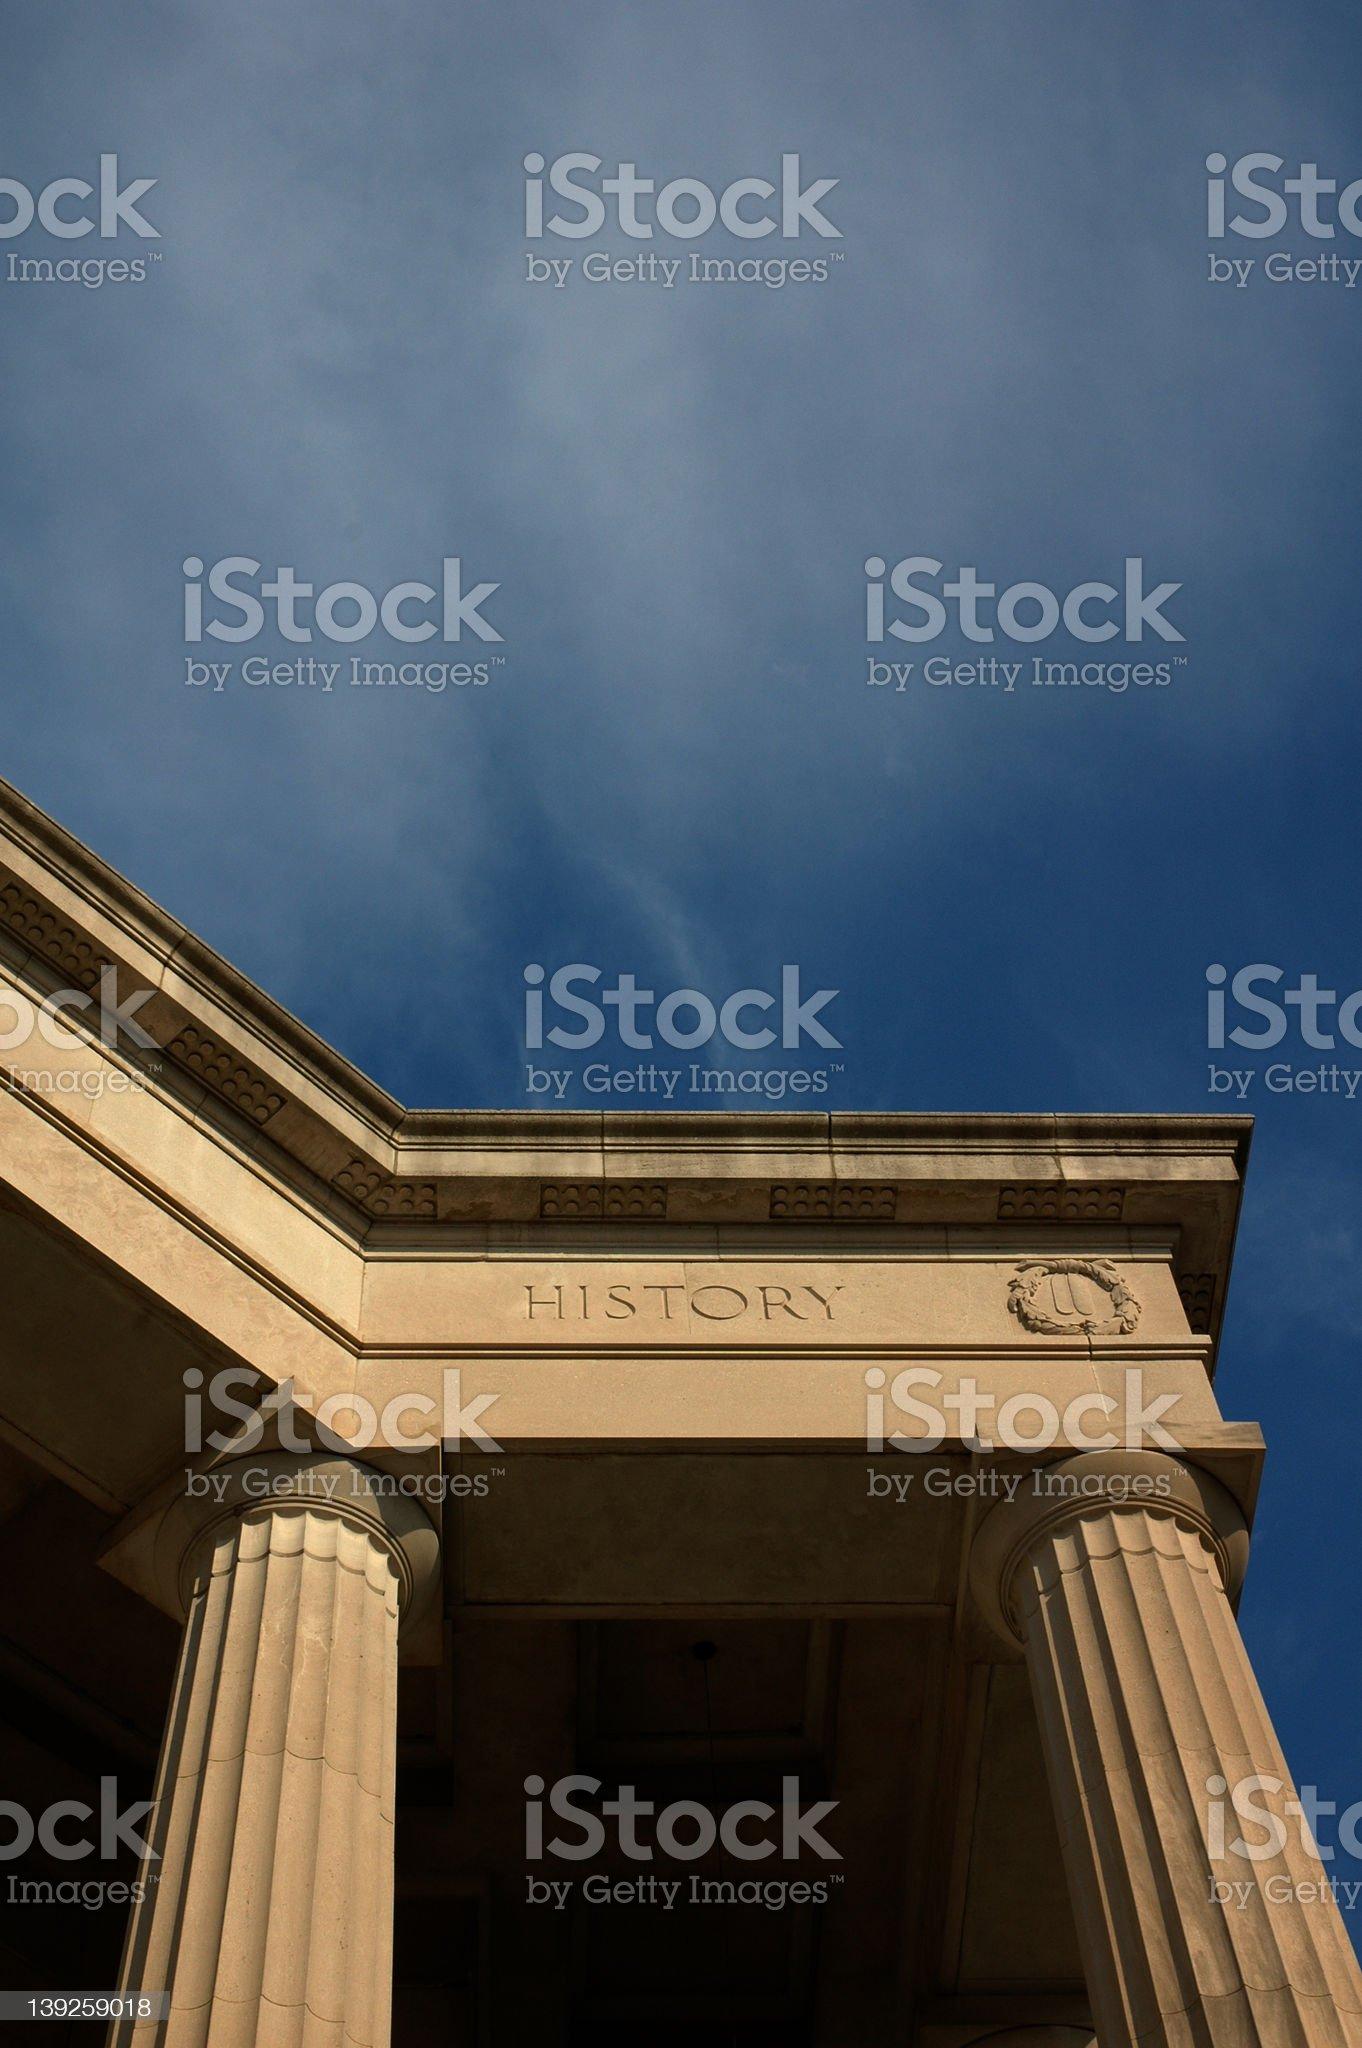 History Foundation royalty-free stock photo